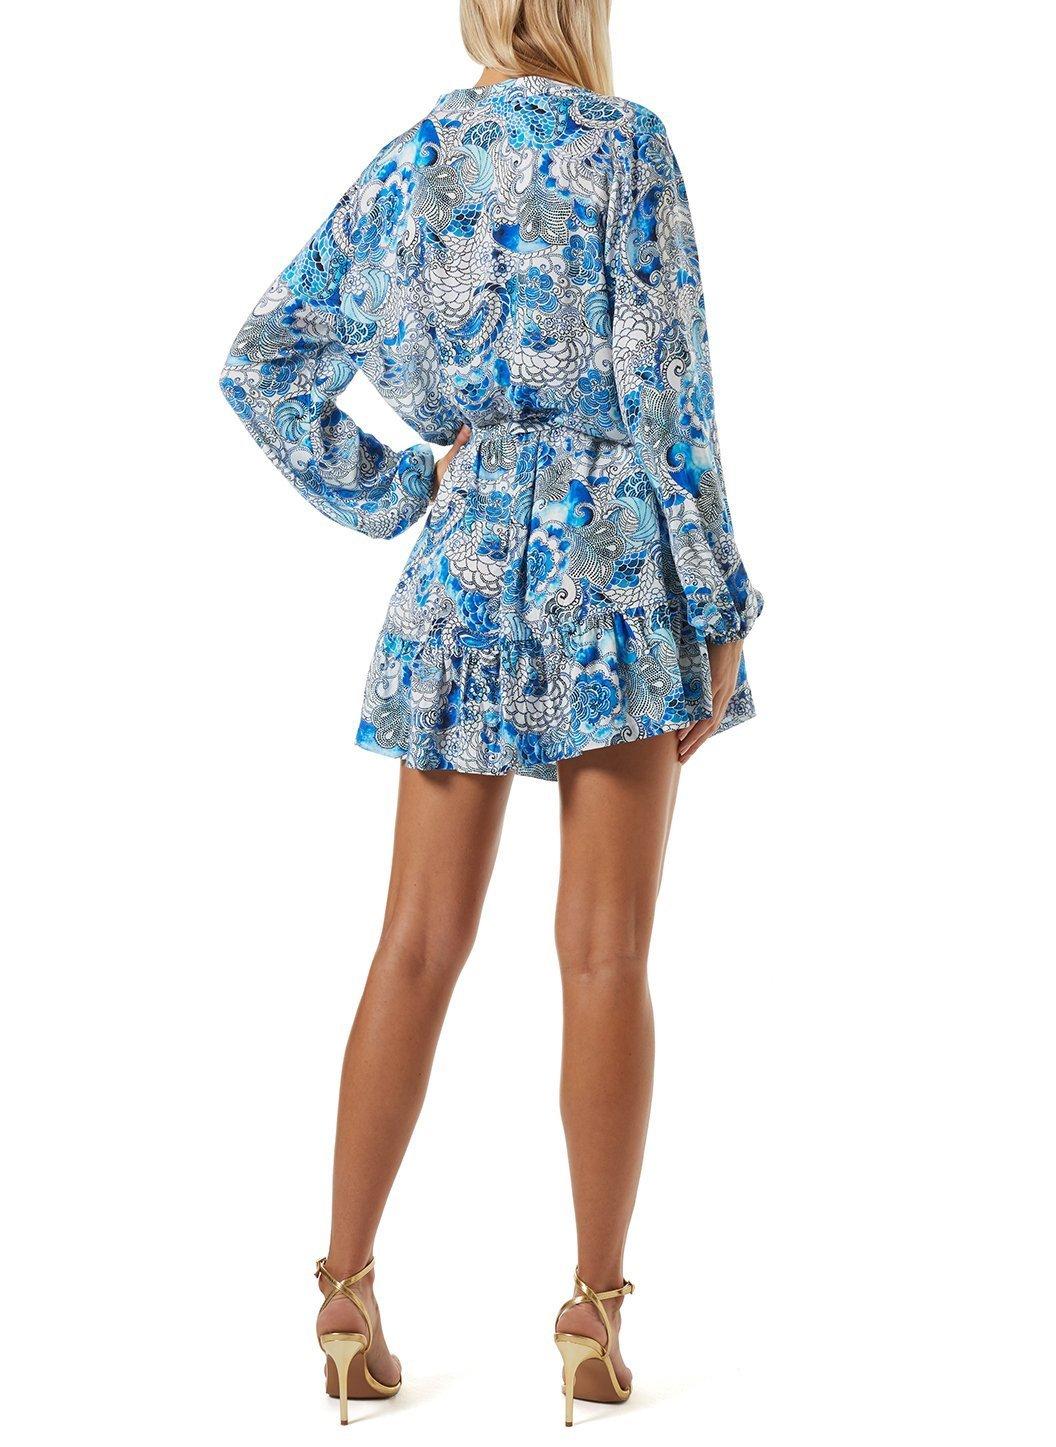 Bluebird_Fantasty_Dress_B_1056x.progressive